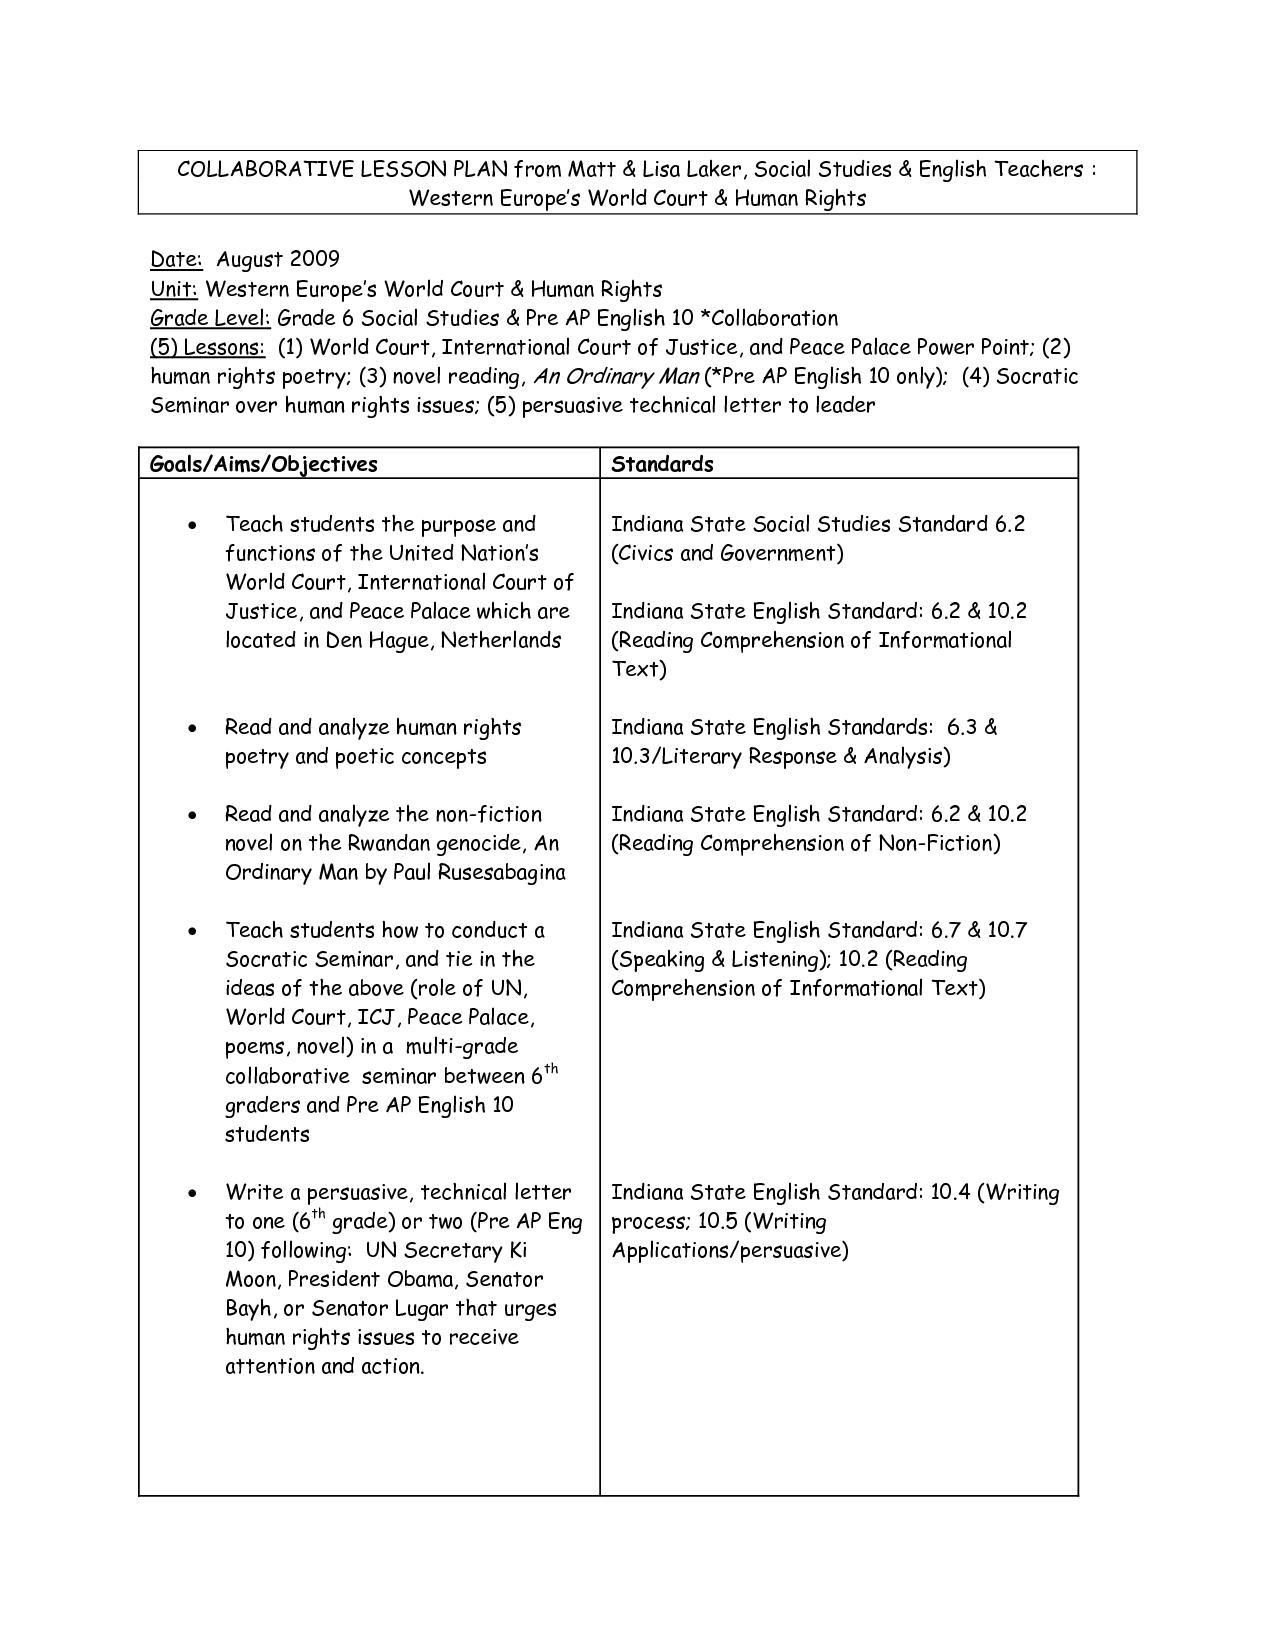 Sample Lesson Plan Format